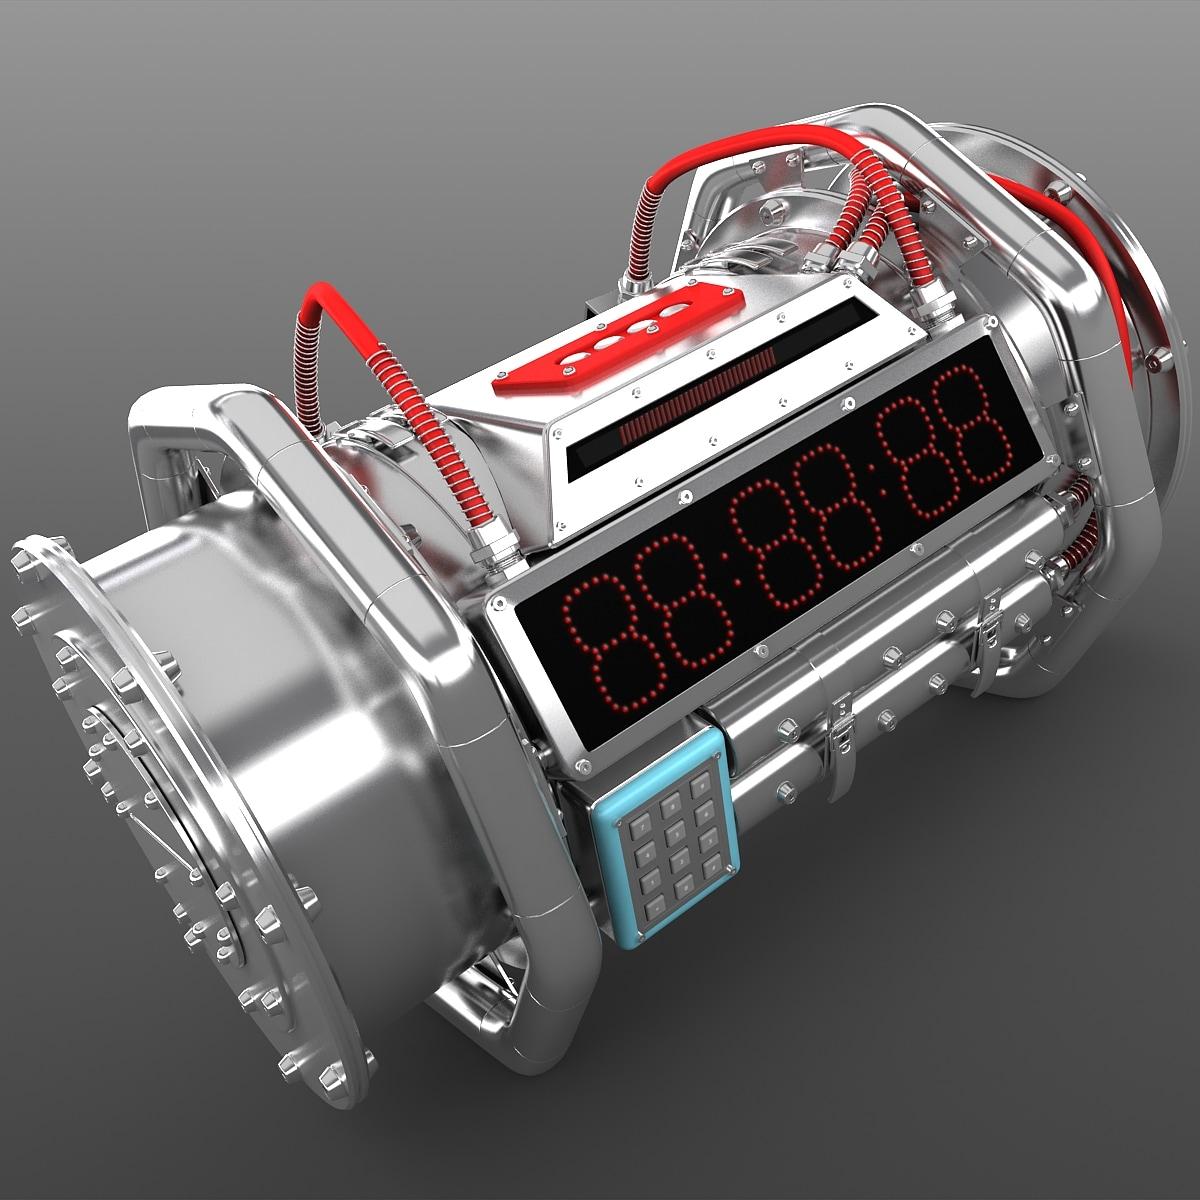 Time_Bomb_002.jpg